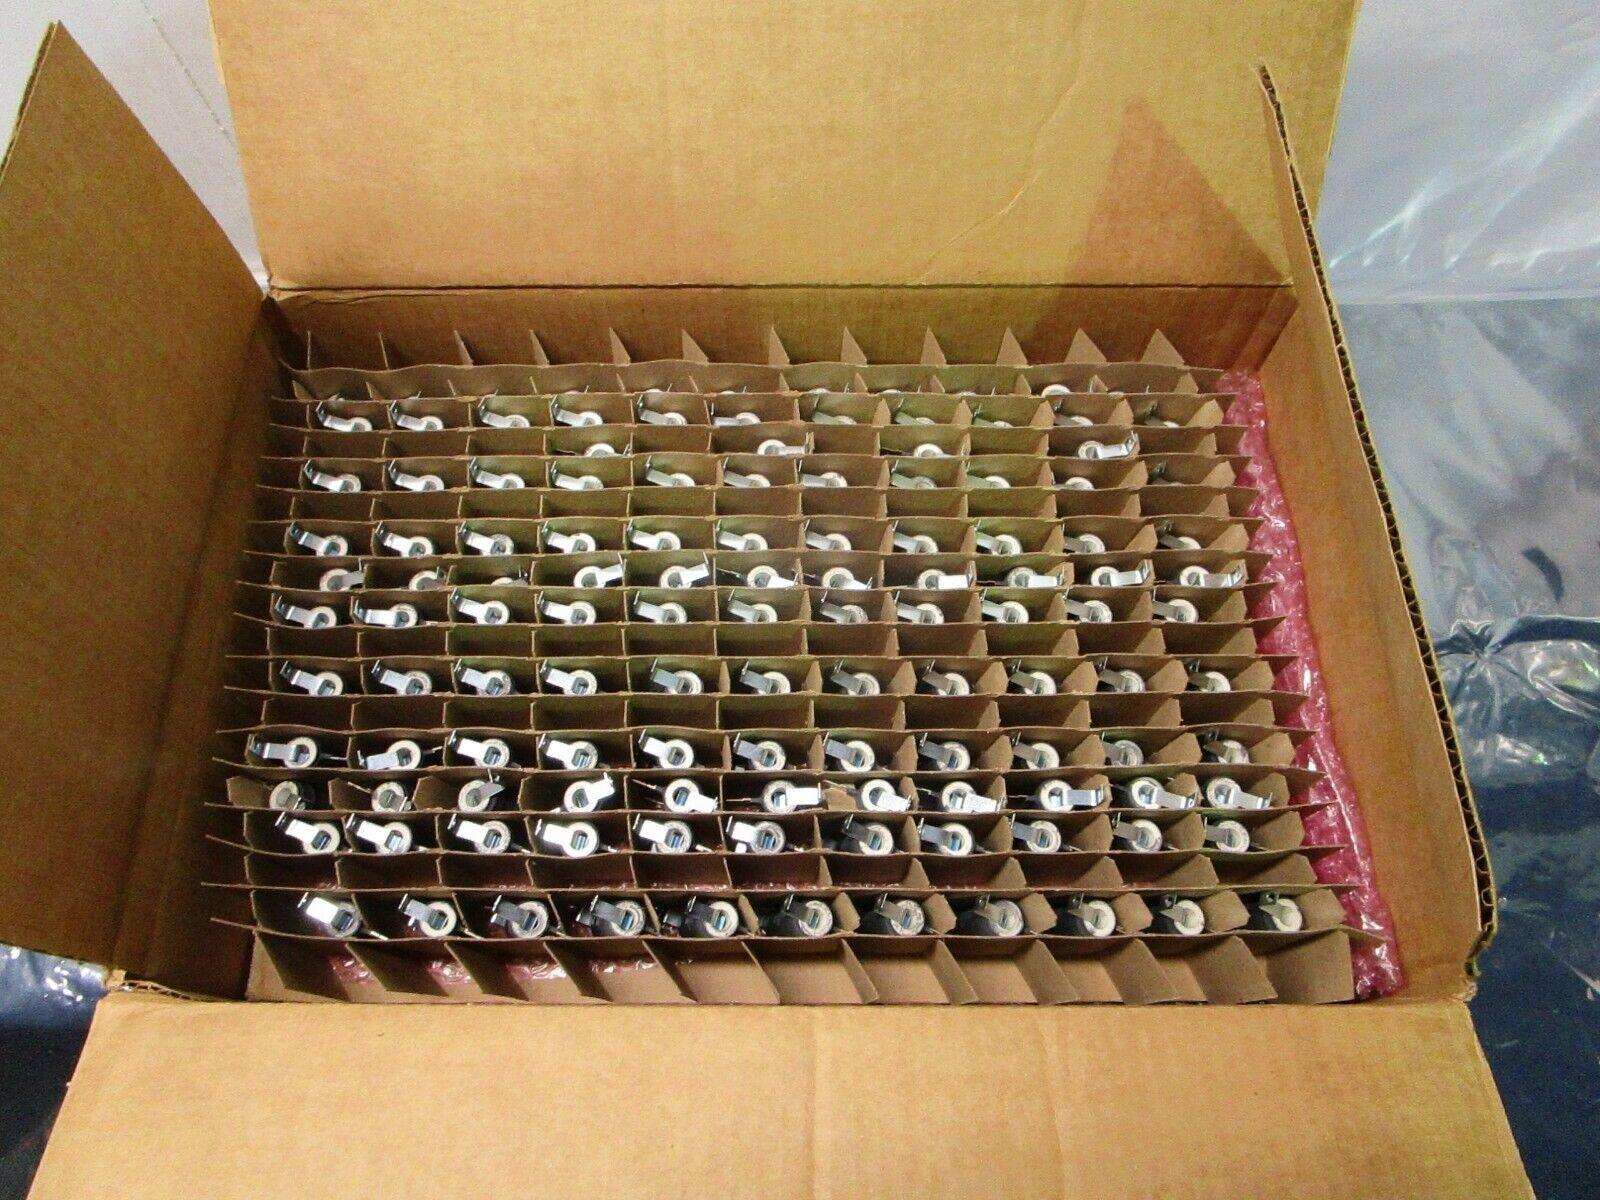 1 Lot of 250 Vishay FST02515E200R0JE92 Wirewound Resistor, 102516